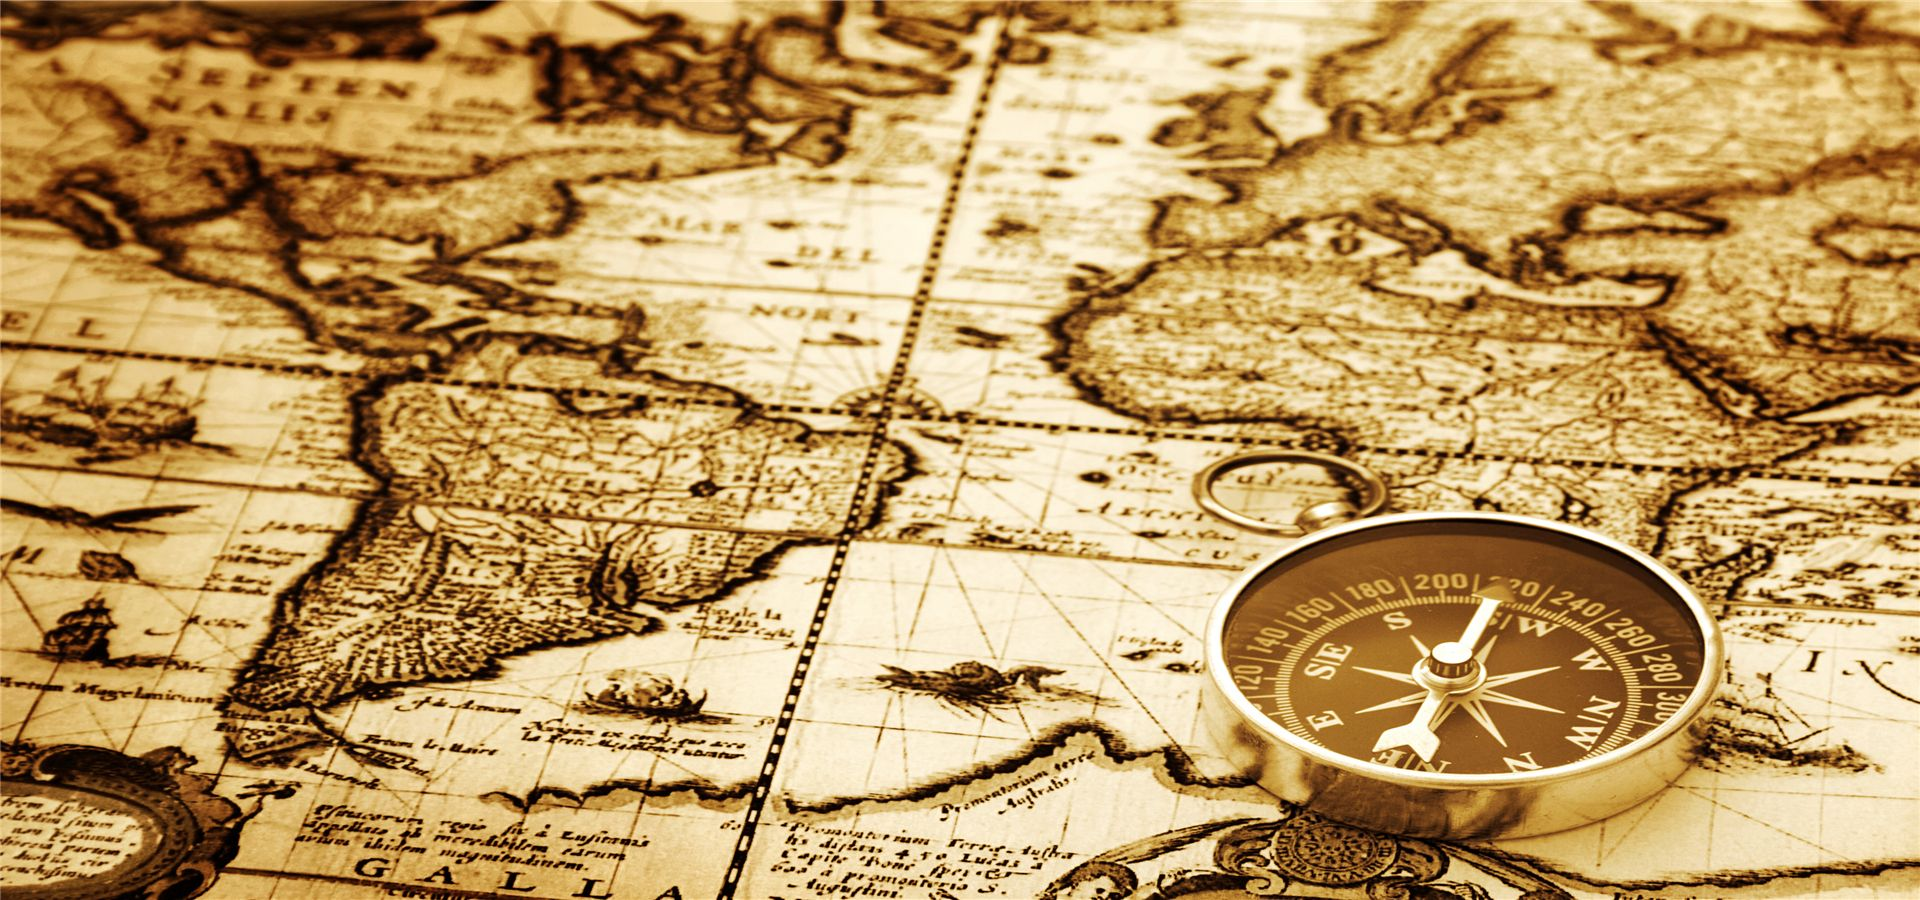 Posters Nostalgic Retro World Map Background Old Map Vintage Maps World Map Wallpaper